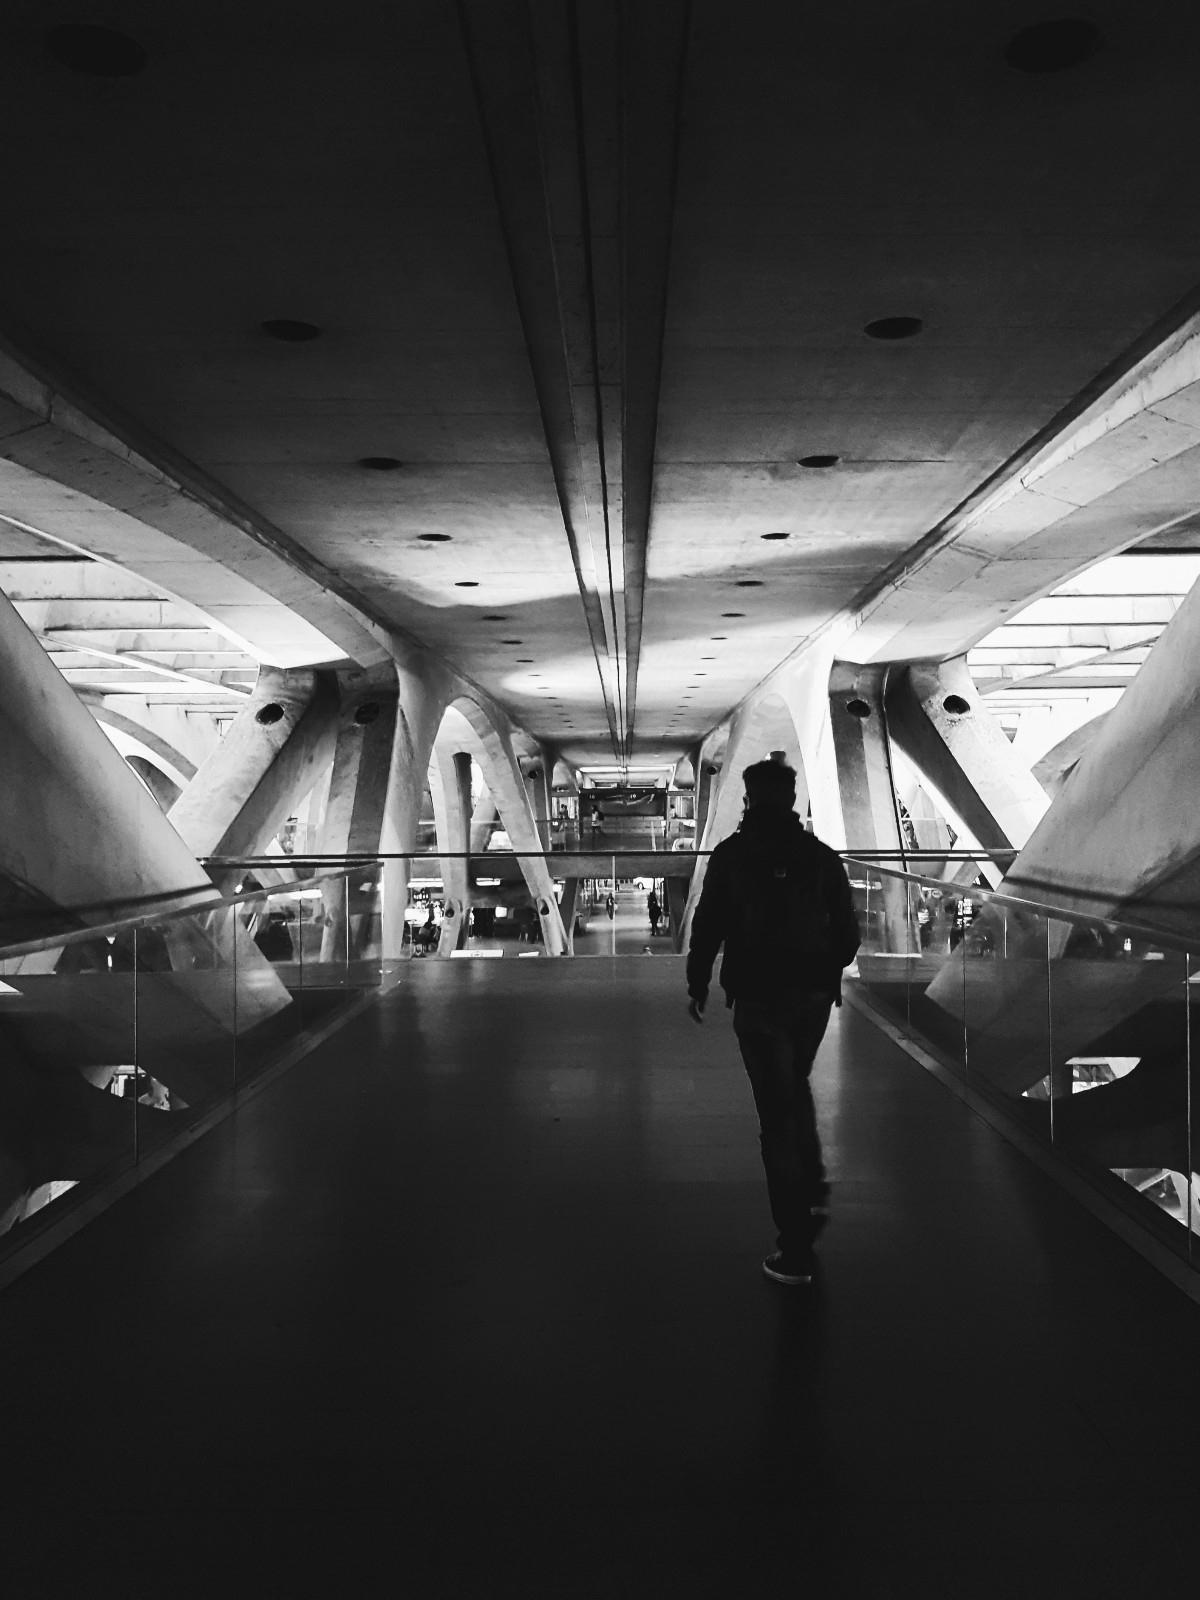 Lisbon-Oriente Station - elloportugal - typhzorz | ello